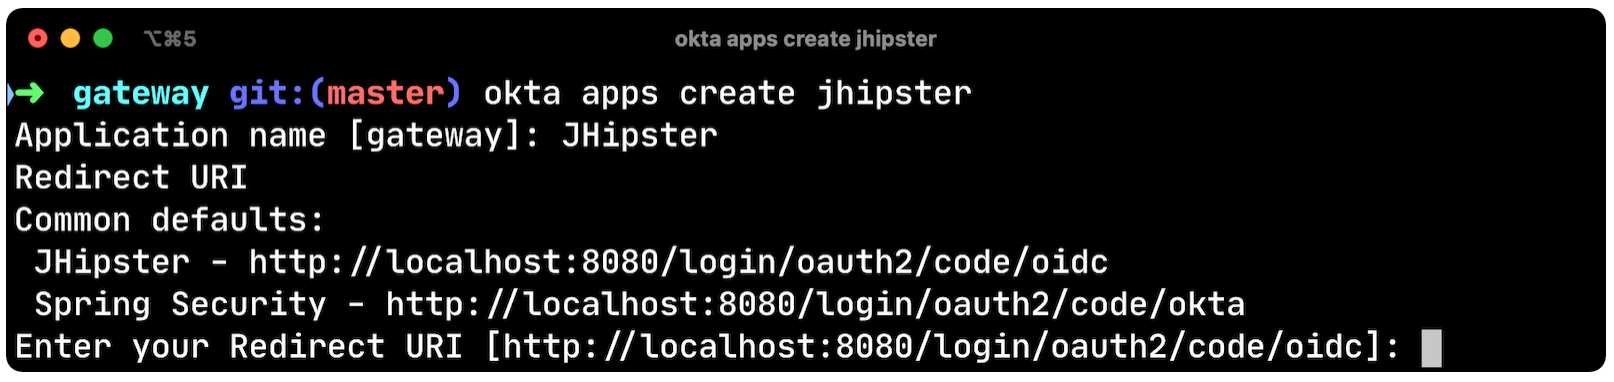 Okta apps create jhipster